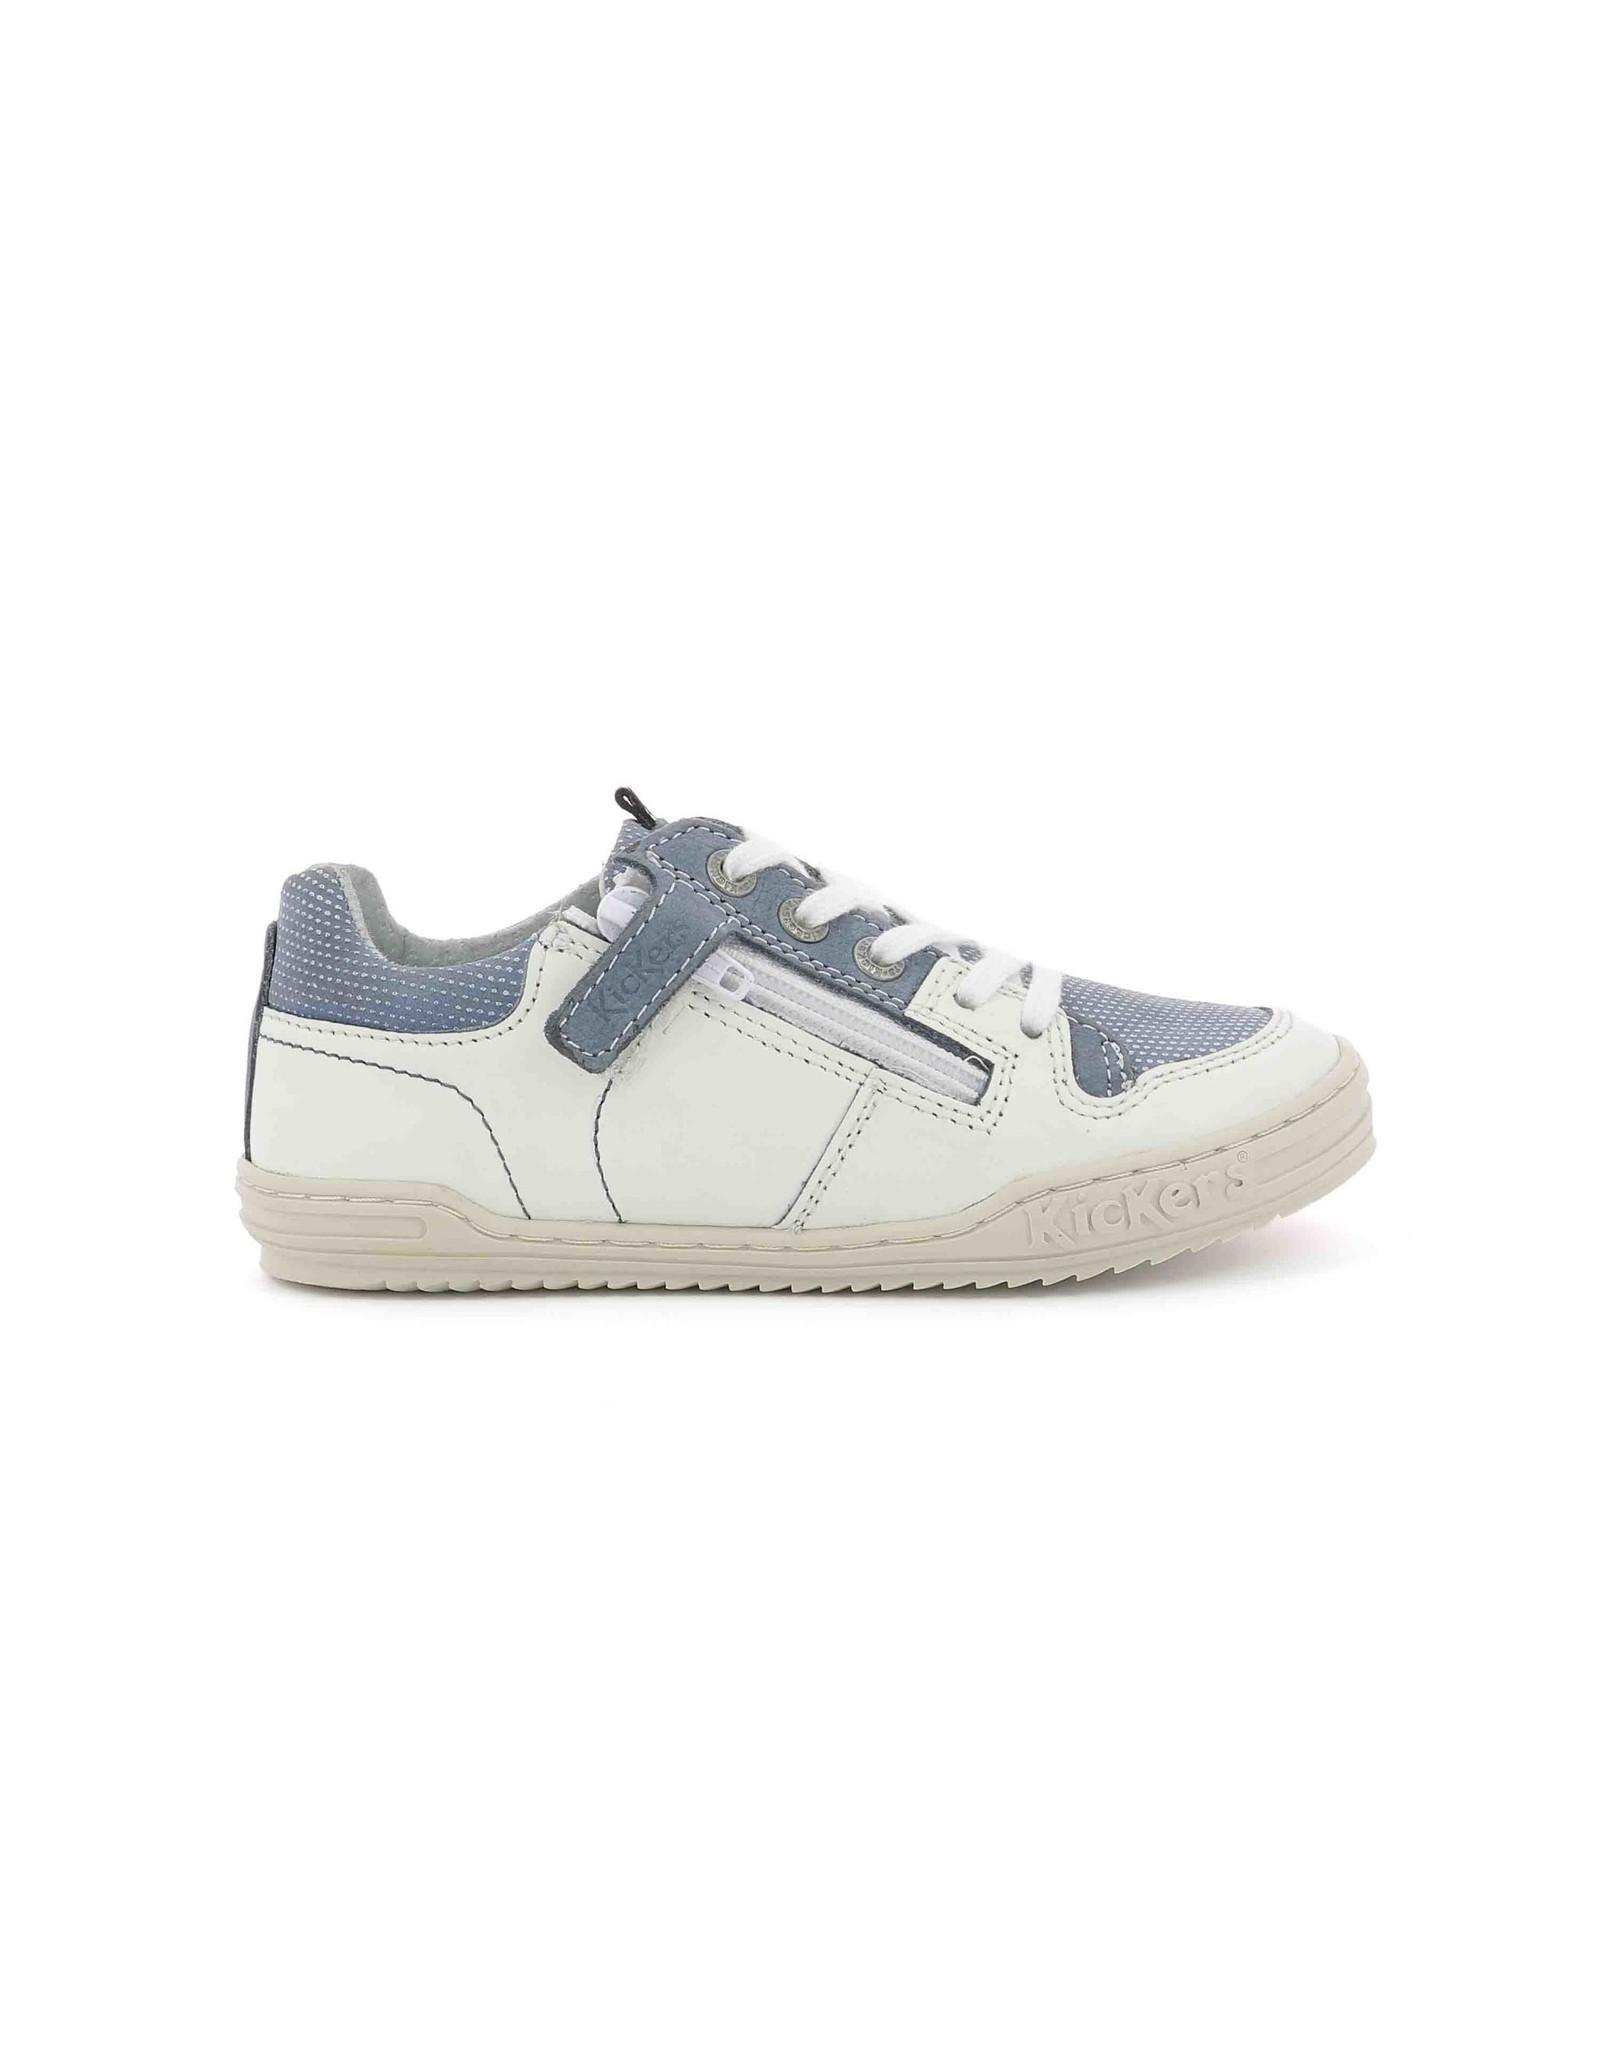 KICKERS JADORE WHITE BLUE K1973WB 19E545532-30